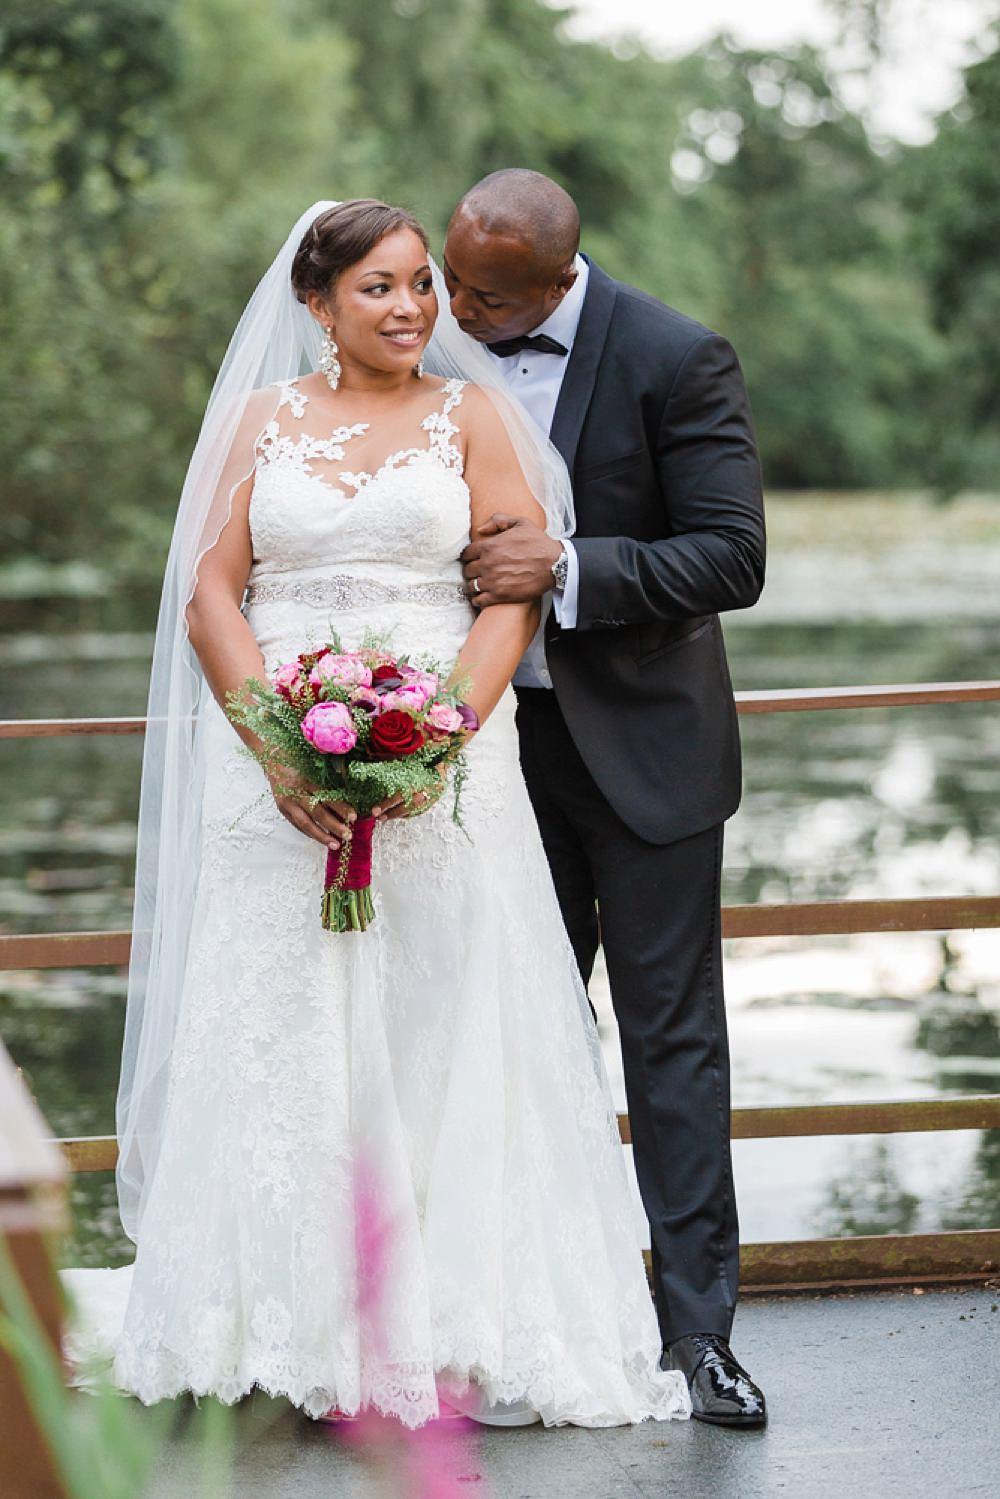 Bride Bridal La Sposa Fit & Flare Lace Dress Gown Floor Length Veil Pink Red Bouquet Hugo Boss Tuxedo Groom Stoke Place Wedding Hannah McClune Photography